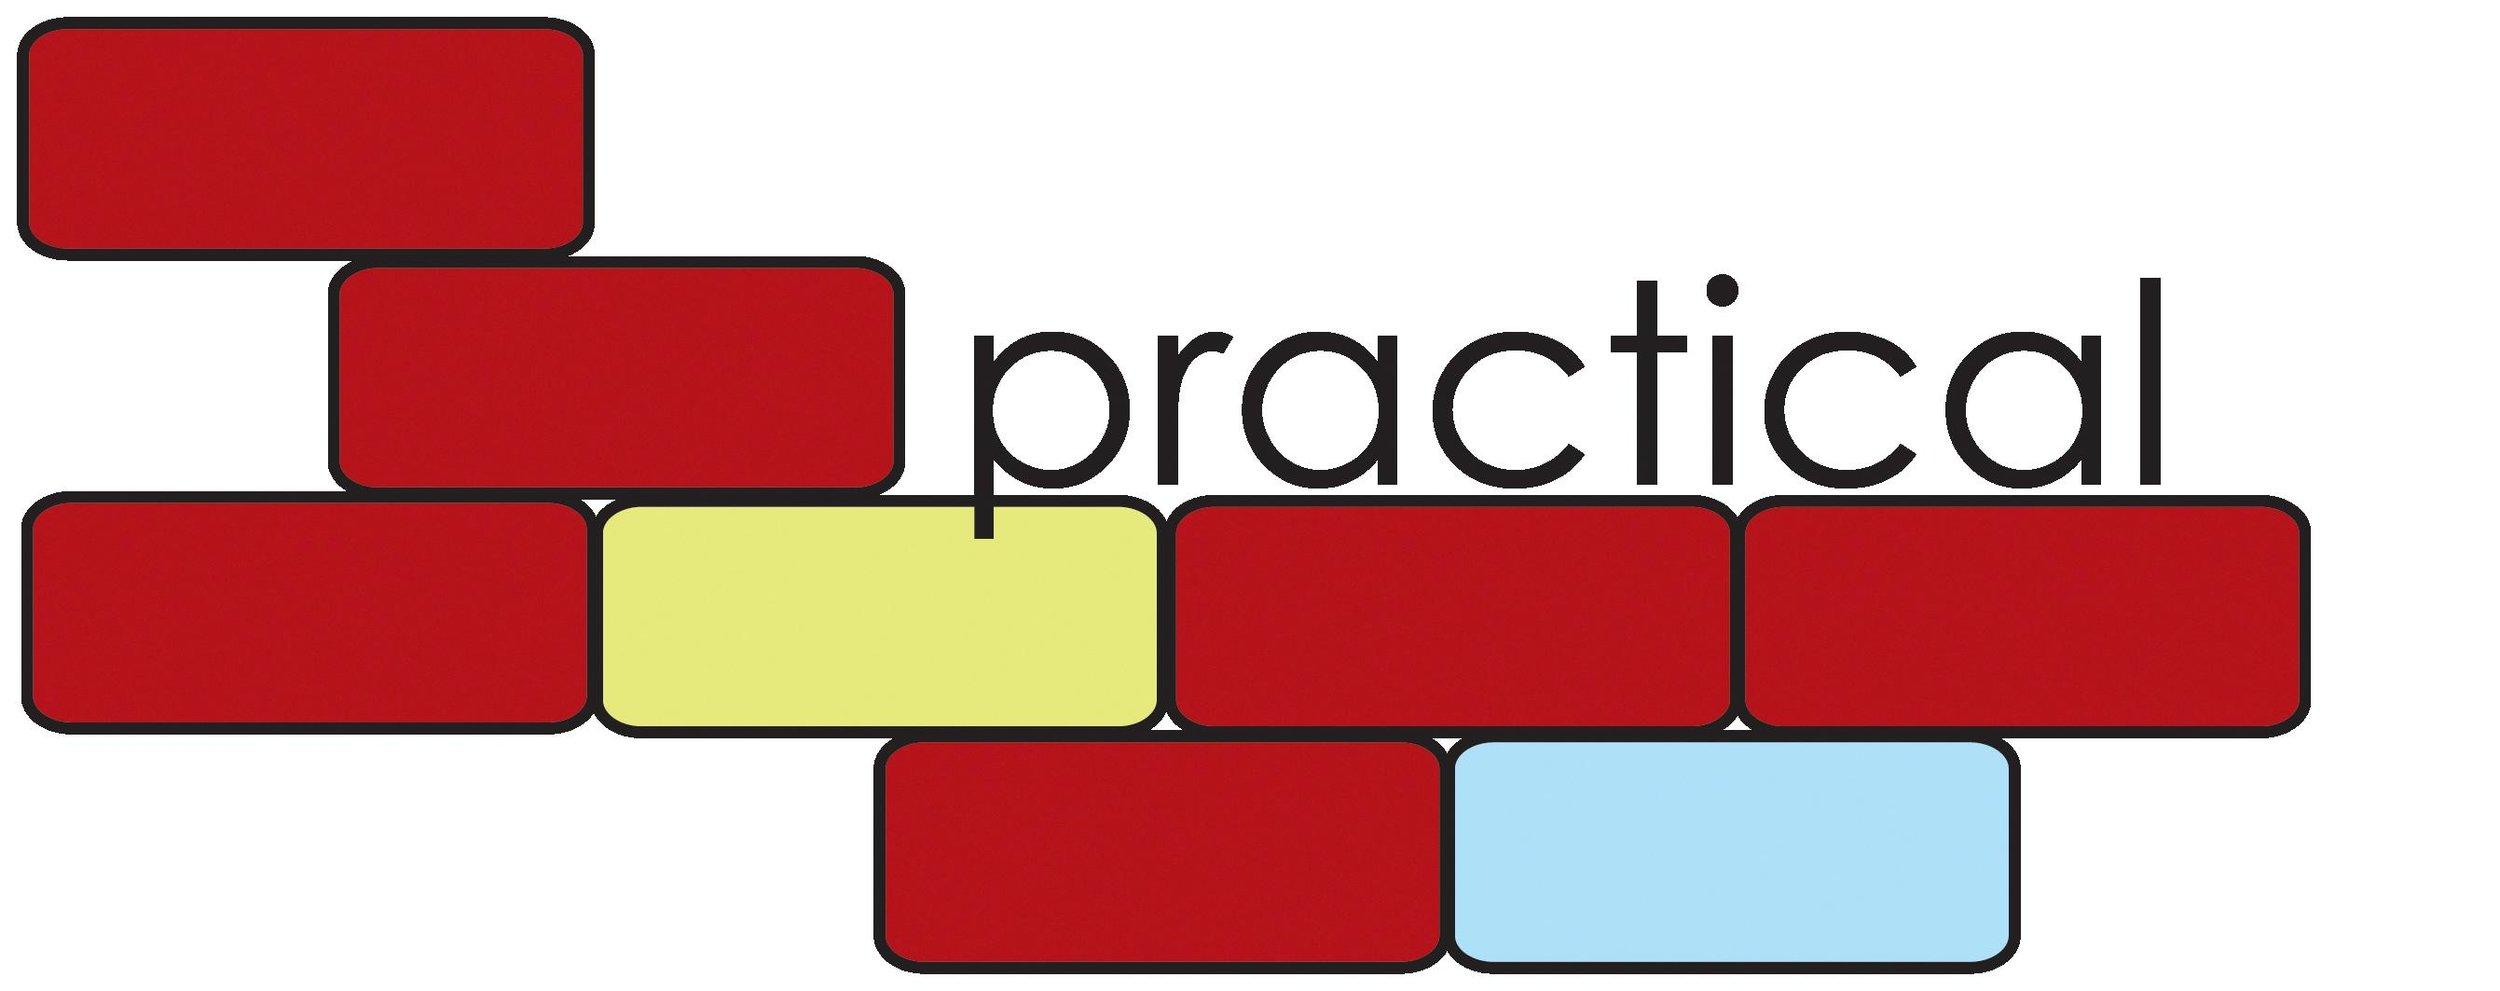 Practical logo.jpg